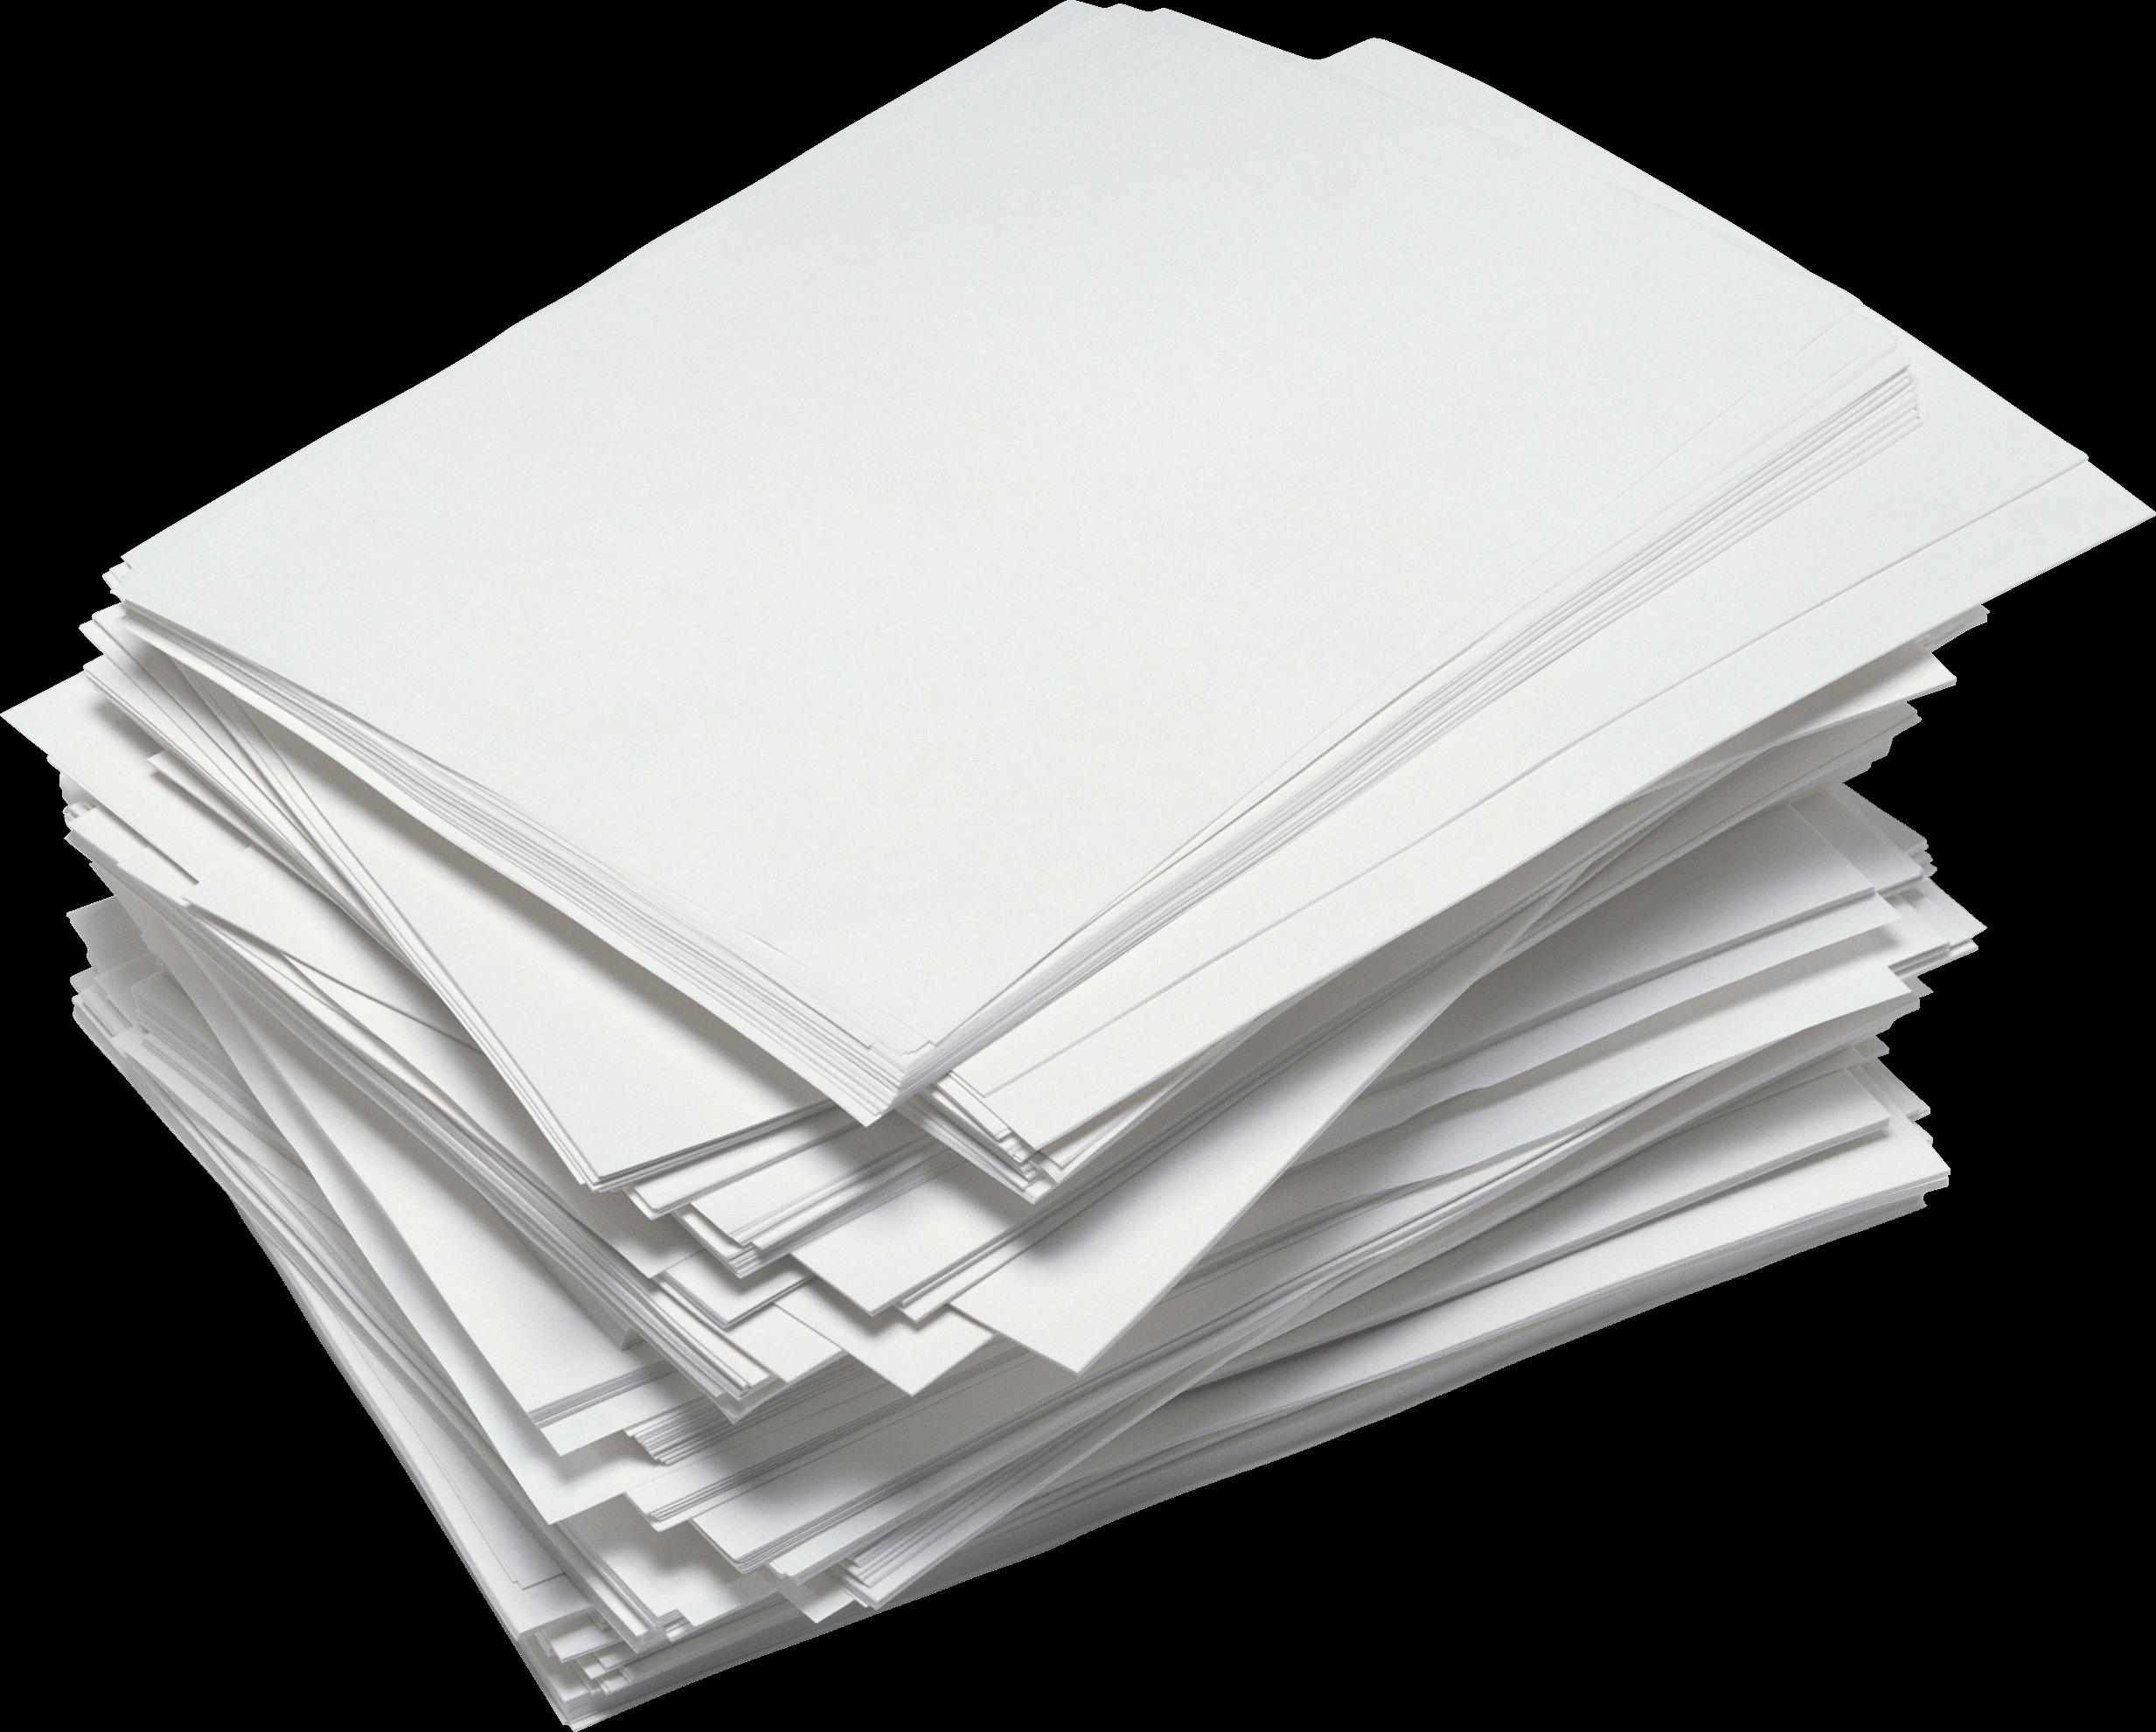 messy paper stack transparent png - stickpng